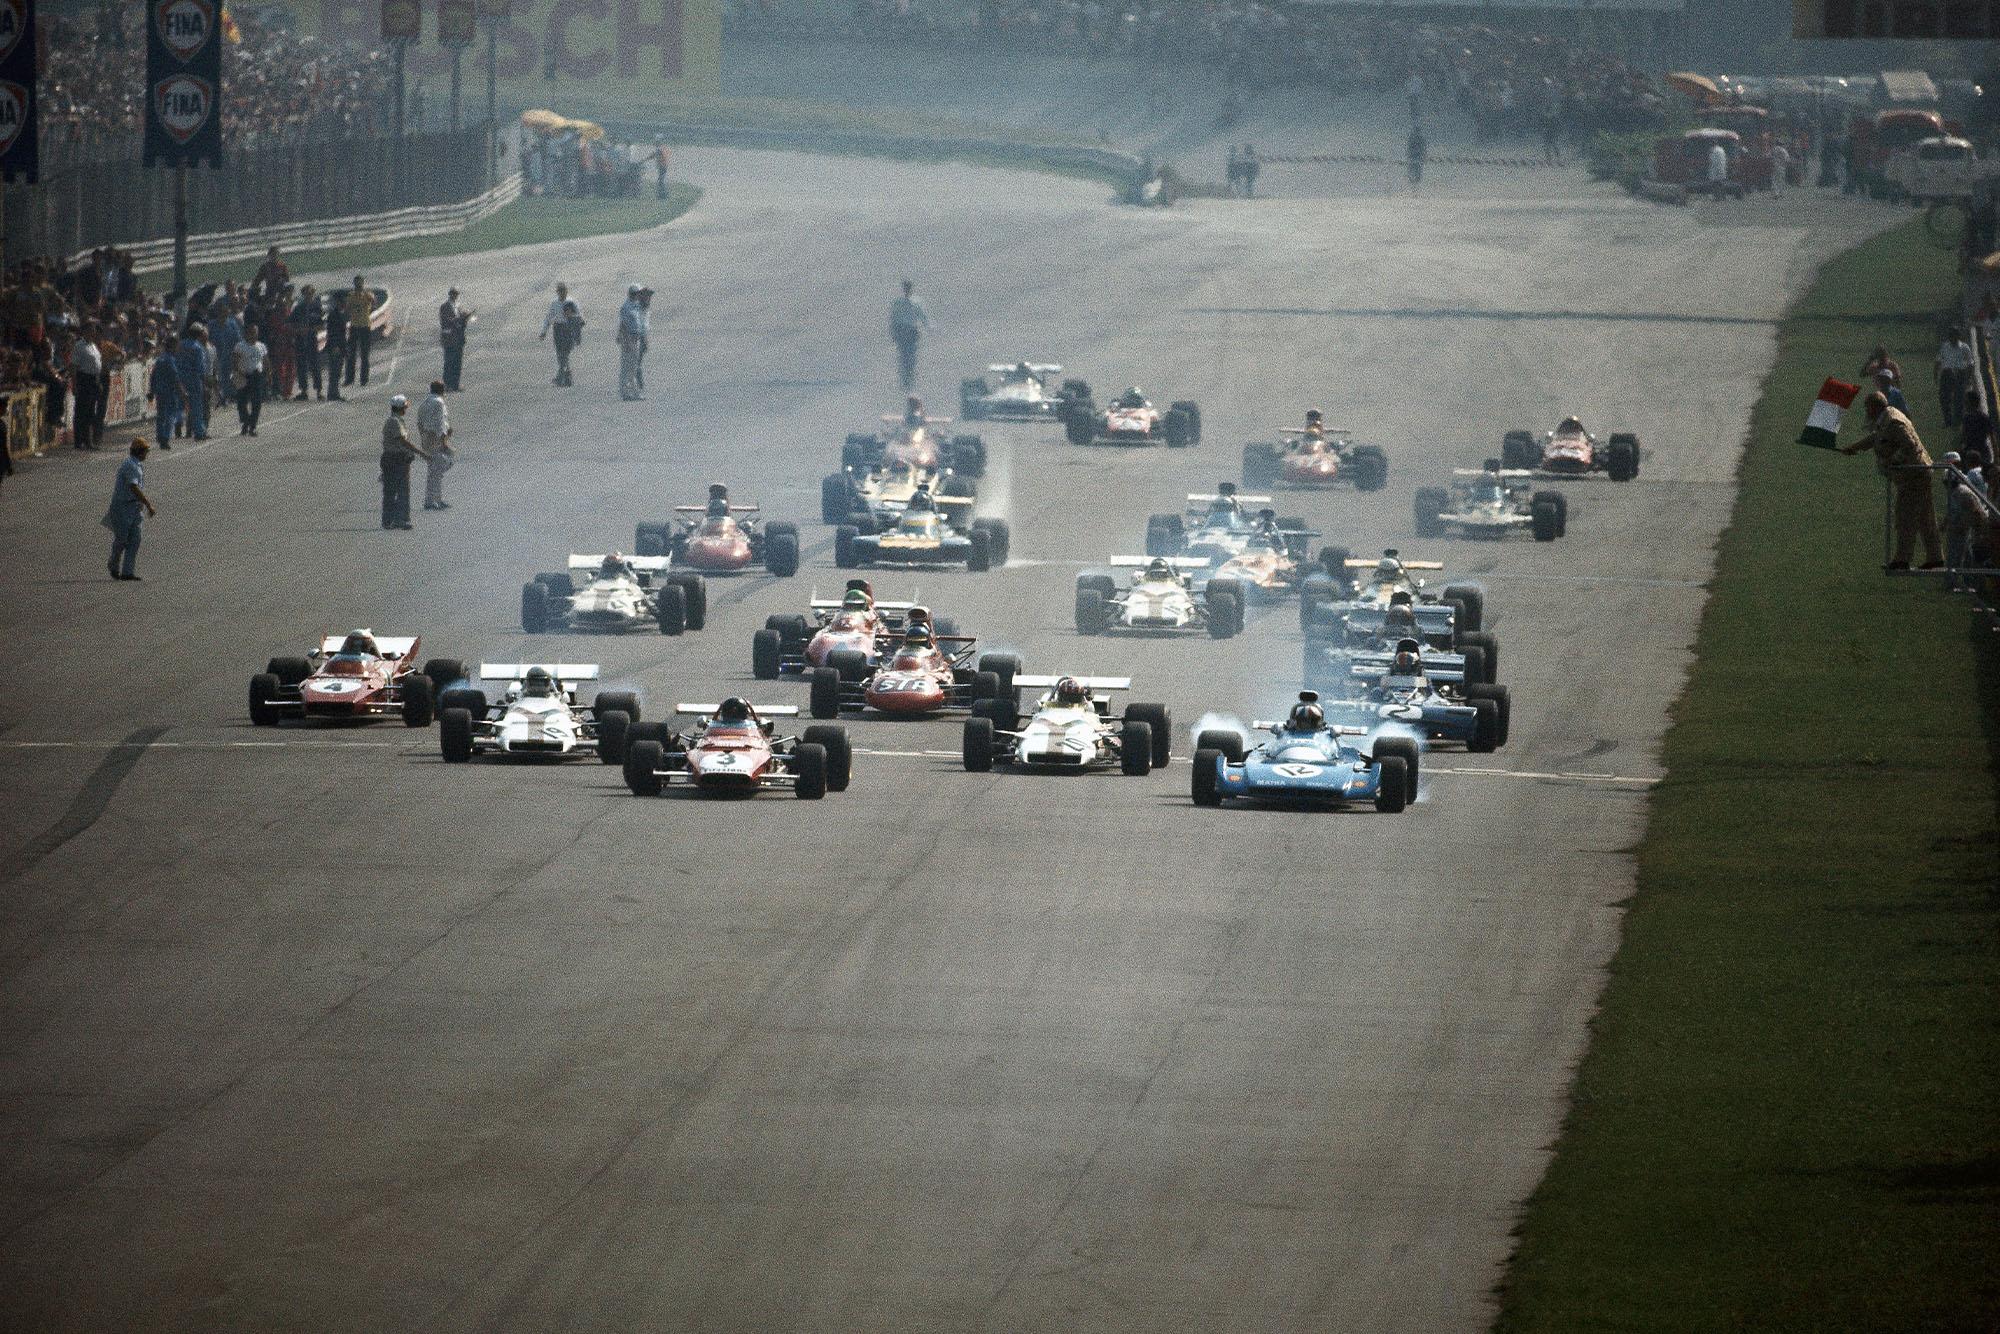 Cars pull away as the 1971 Italian Grand Prix starts.